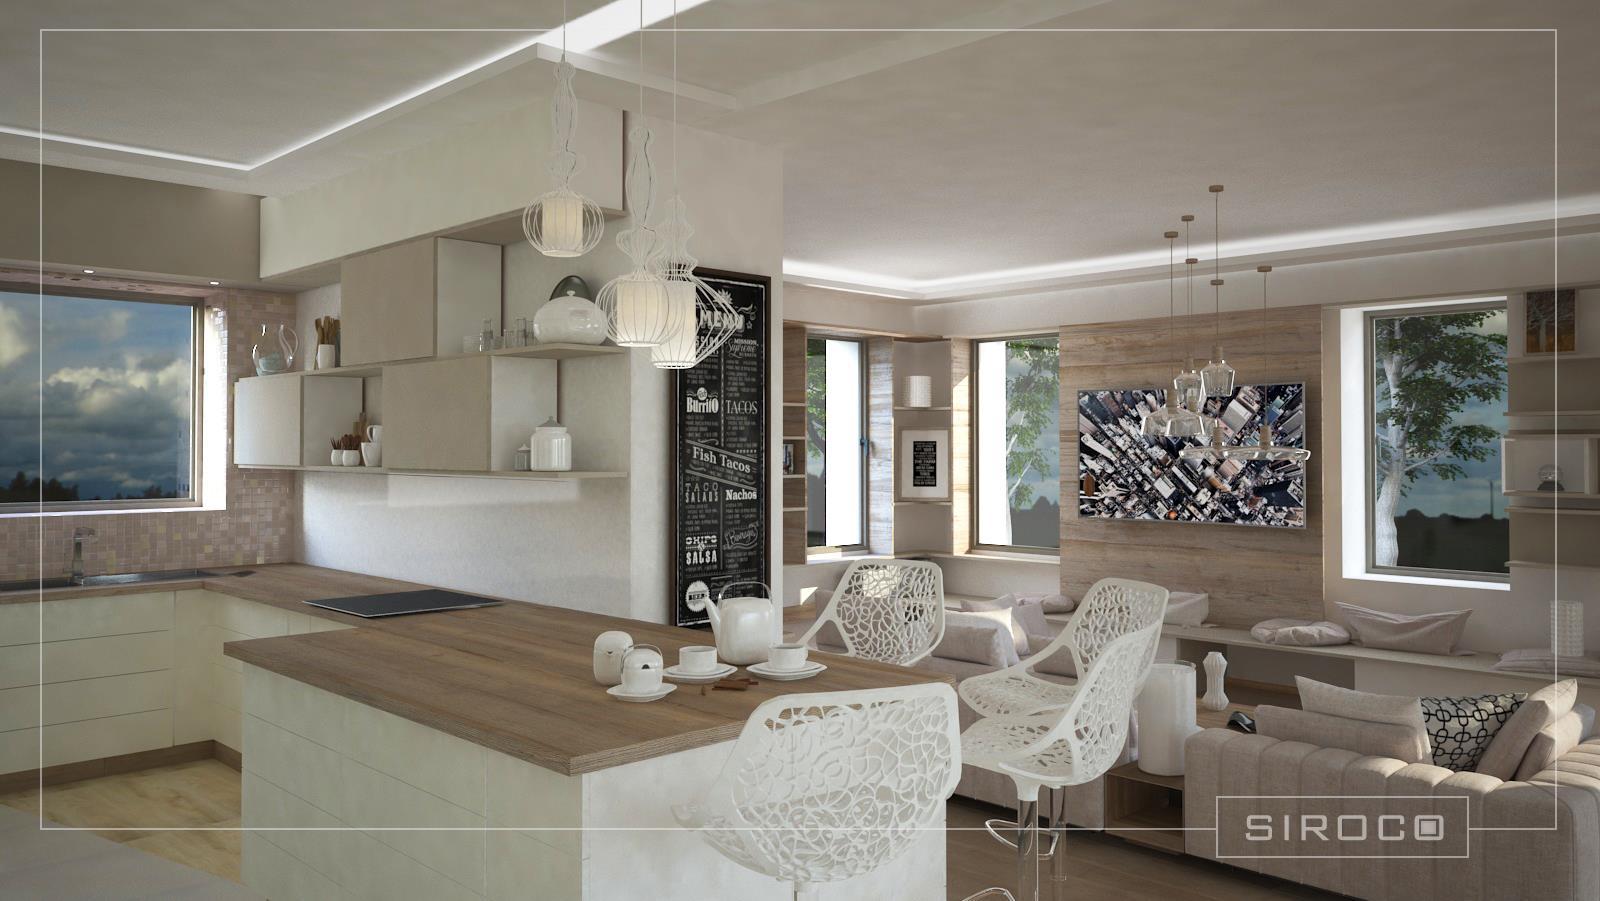 design-software-archlinexp-kitchen-view